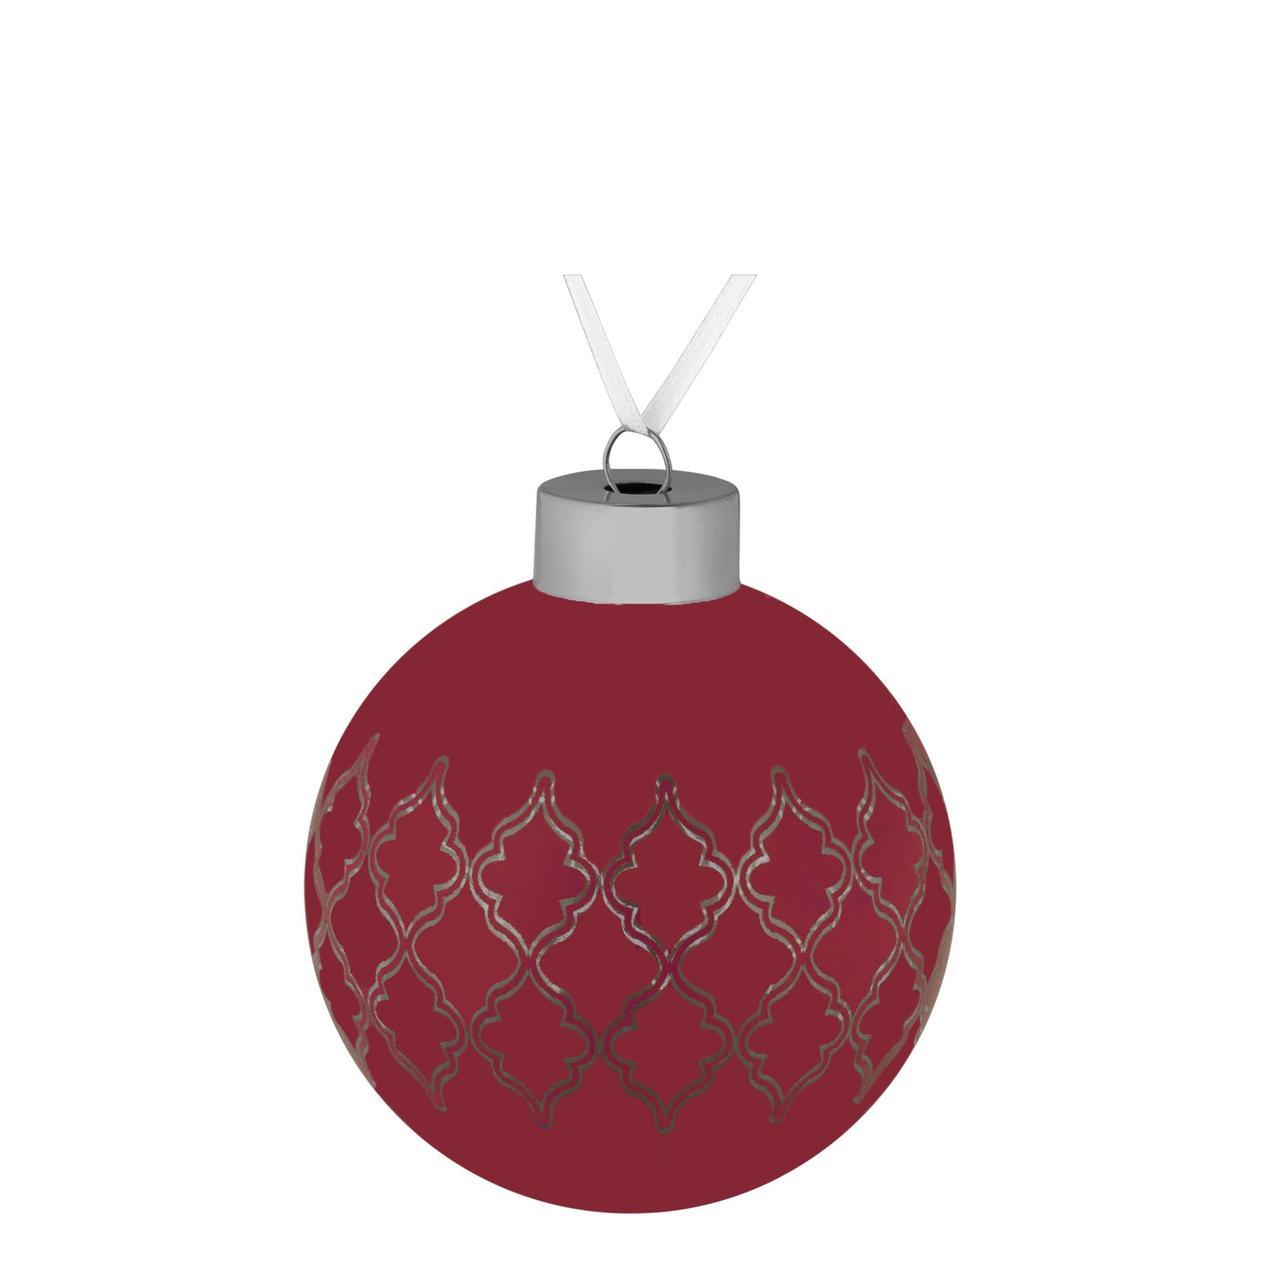 Елочный шар King, 8 см, красный (артикул 7163.50)